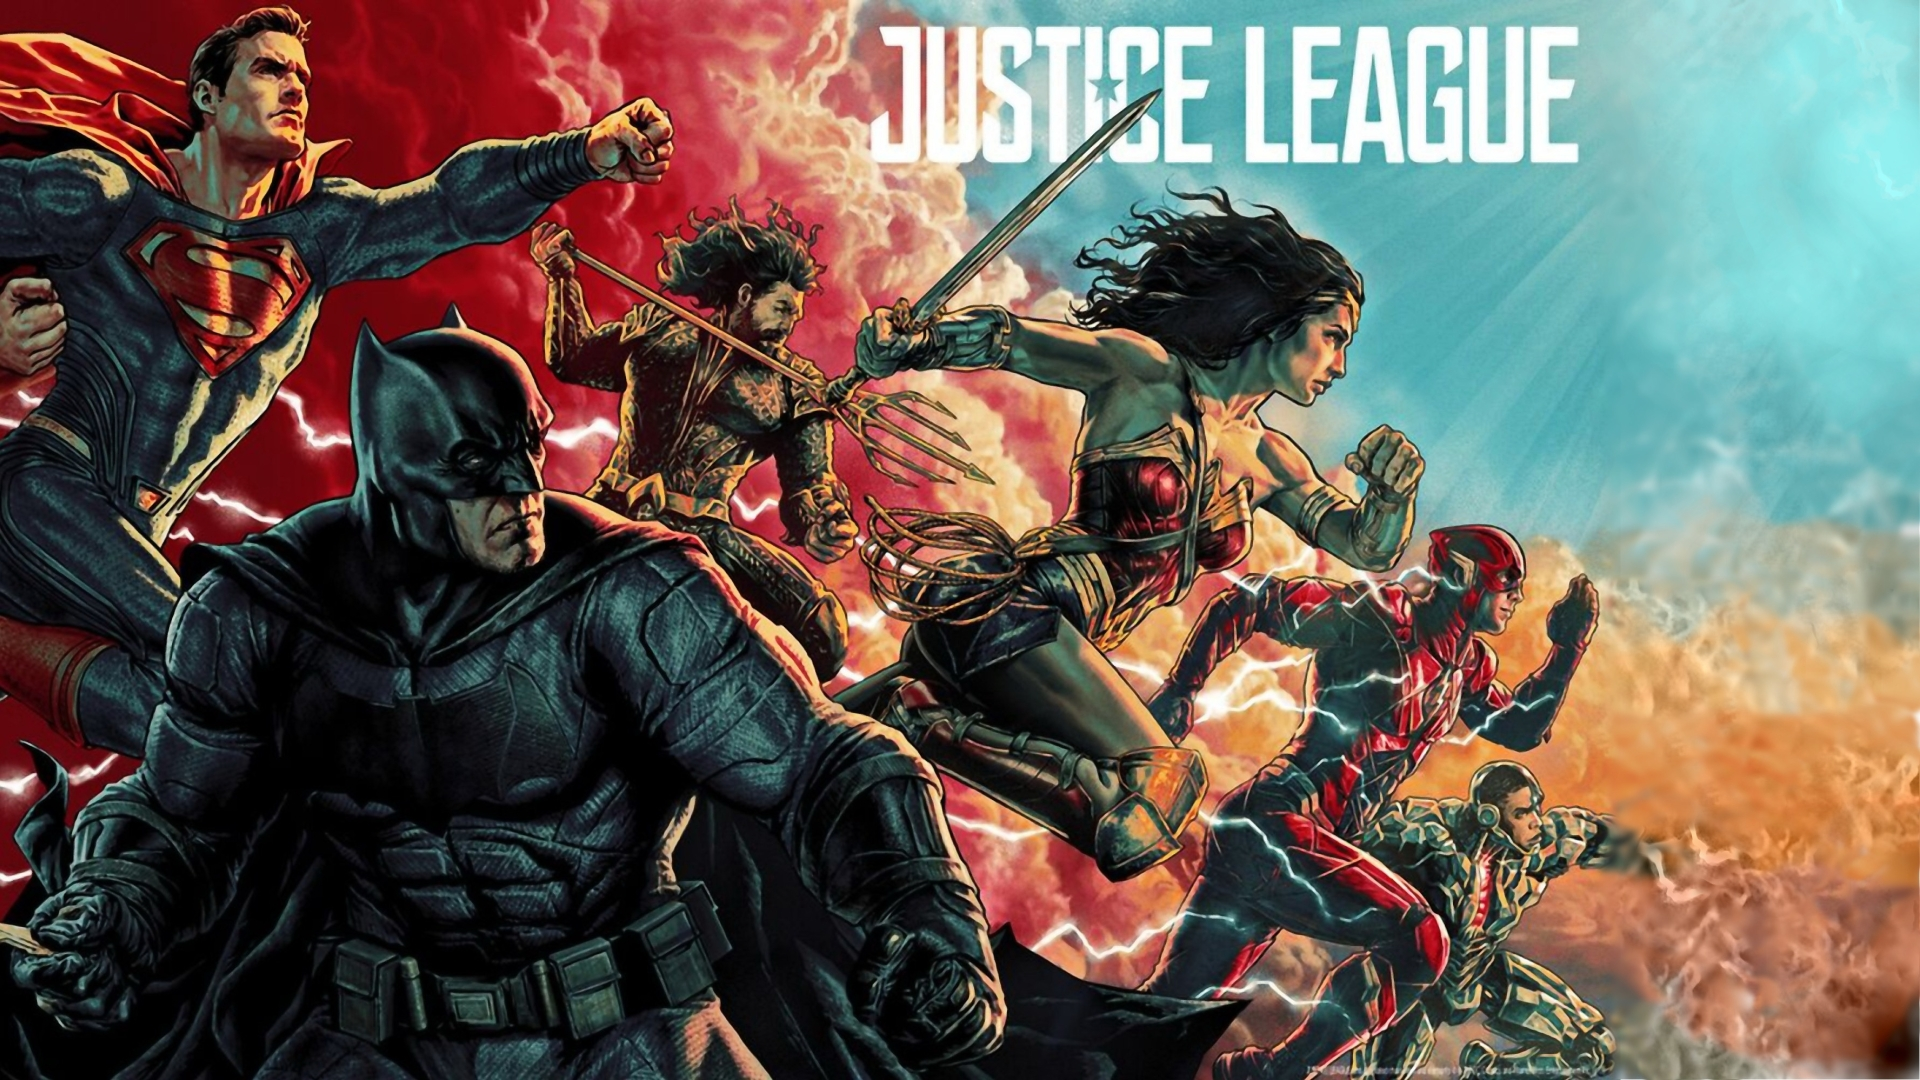 1920x1080 Justice League Comic Art Poster 1080p Laptop Full